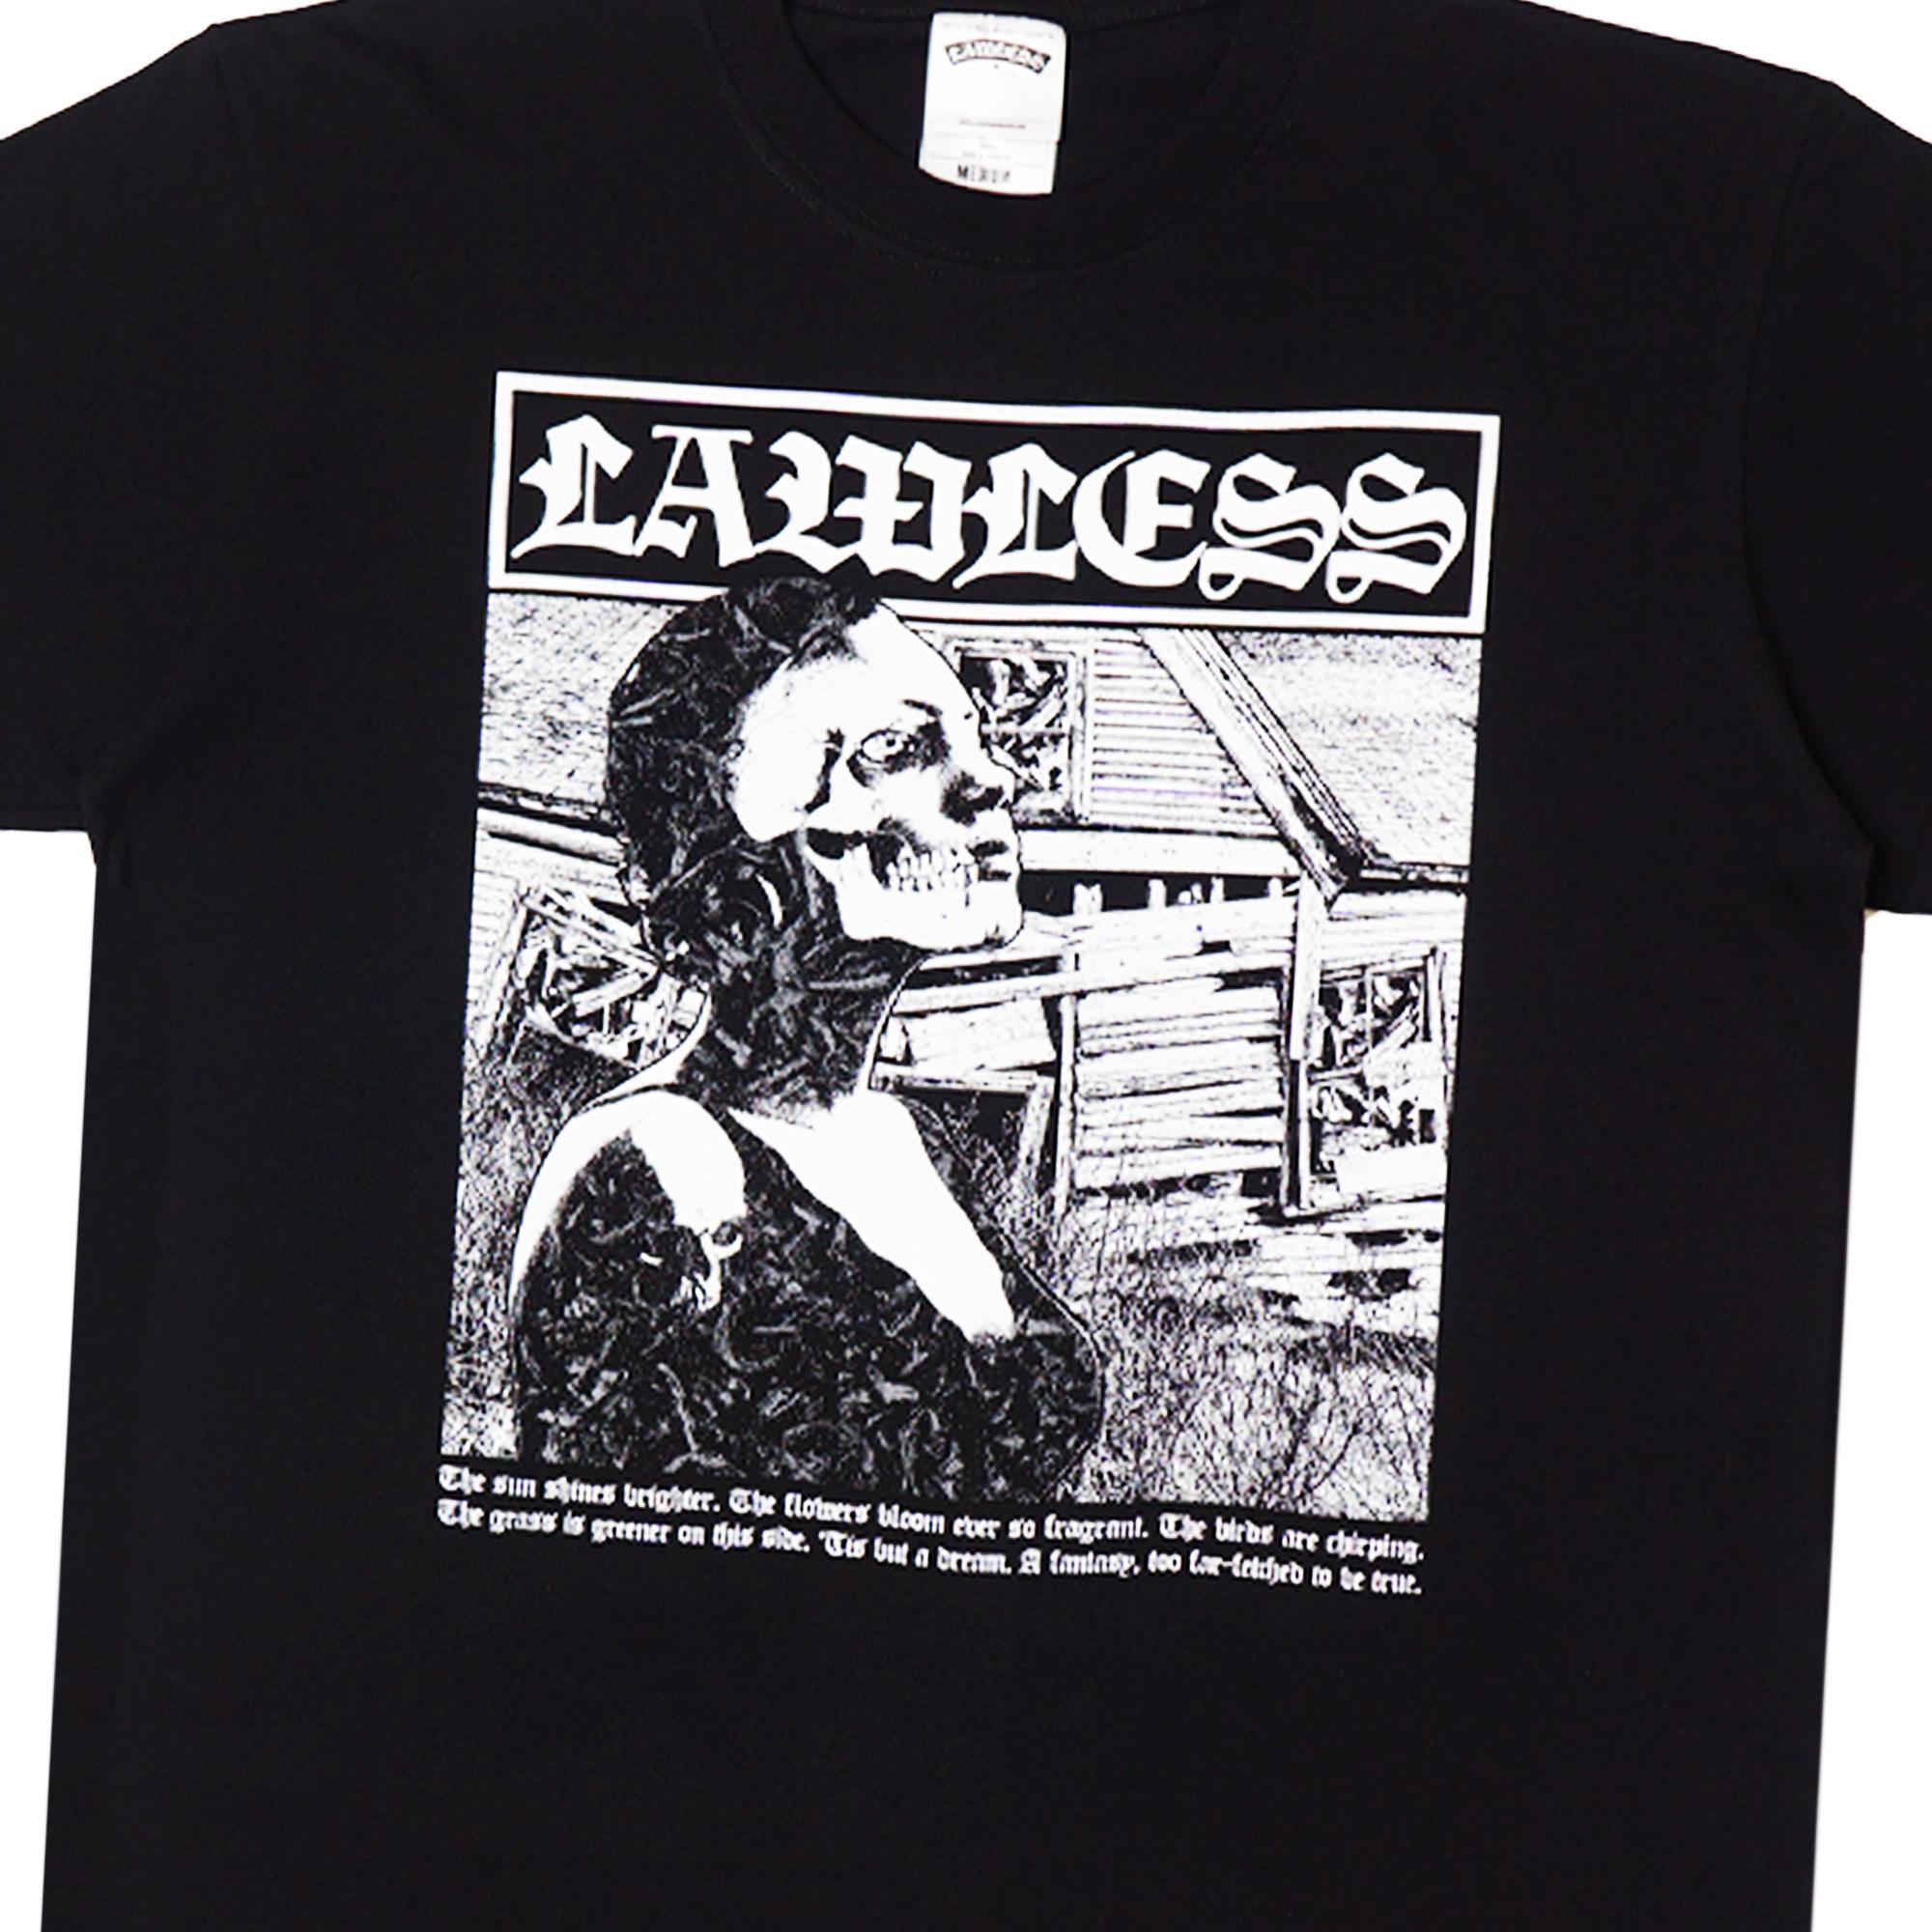 lawless_Brokendreams_detail